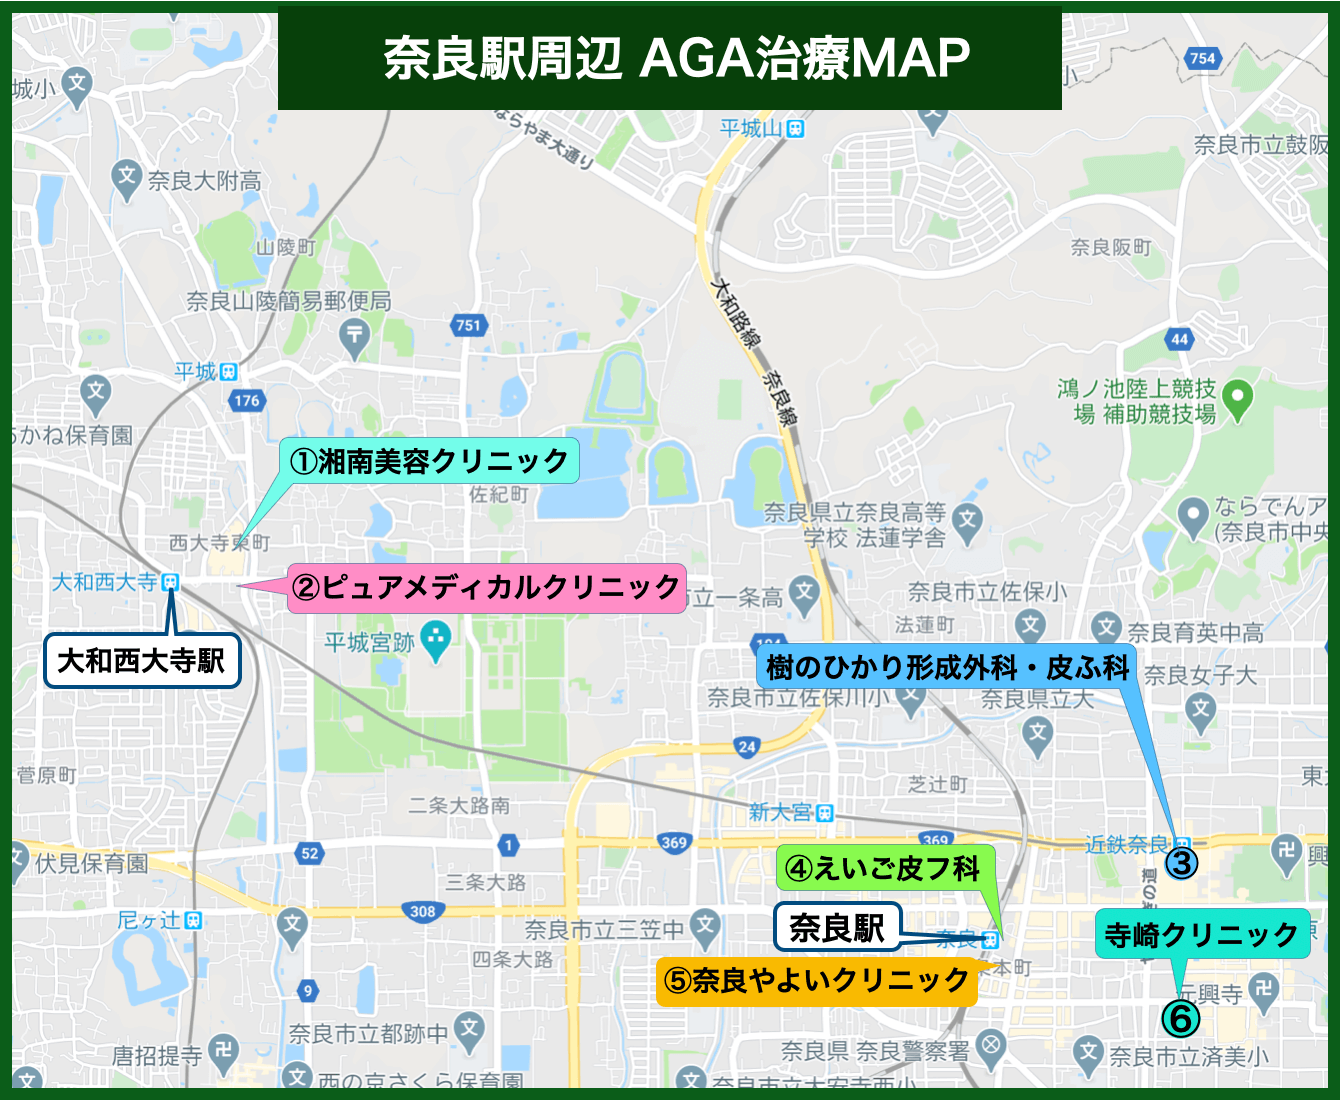 奈良駅周辺 AGA治療MAP